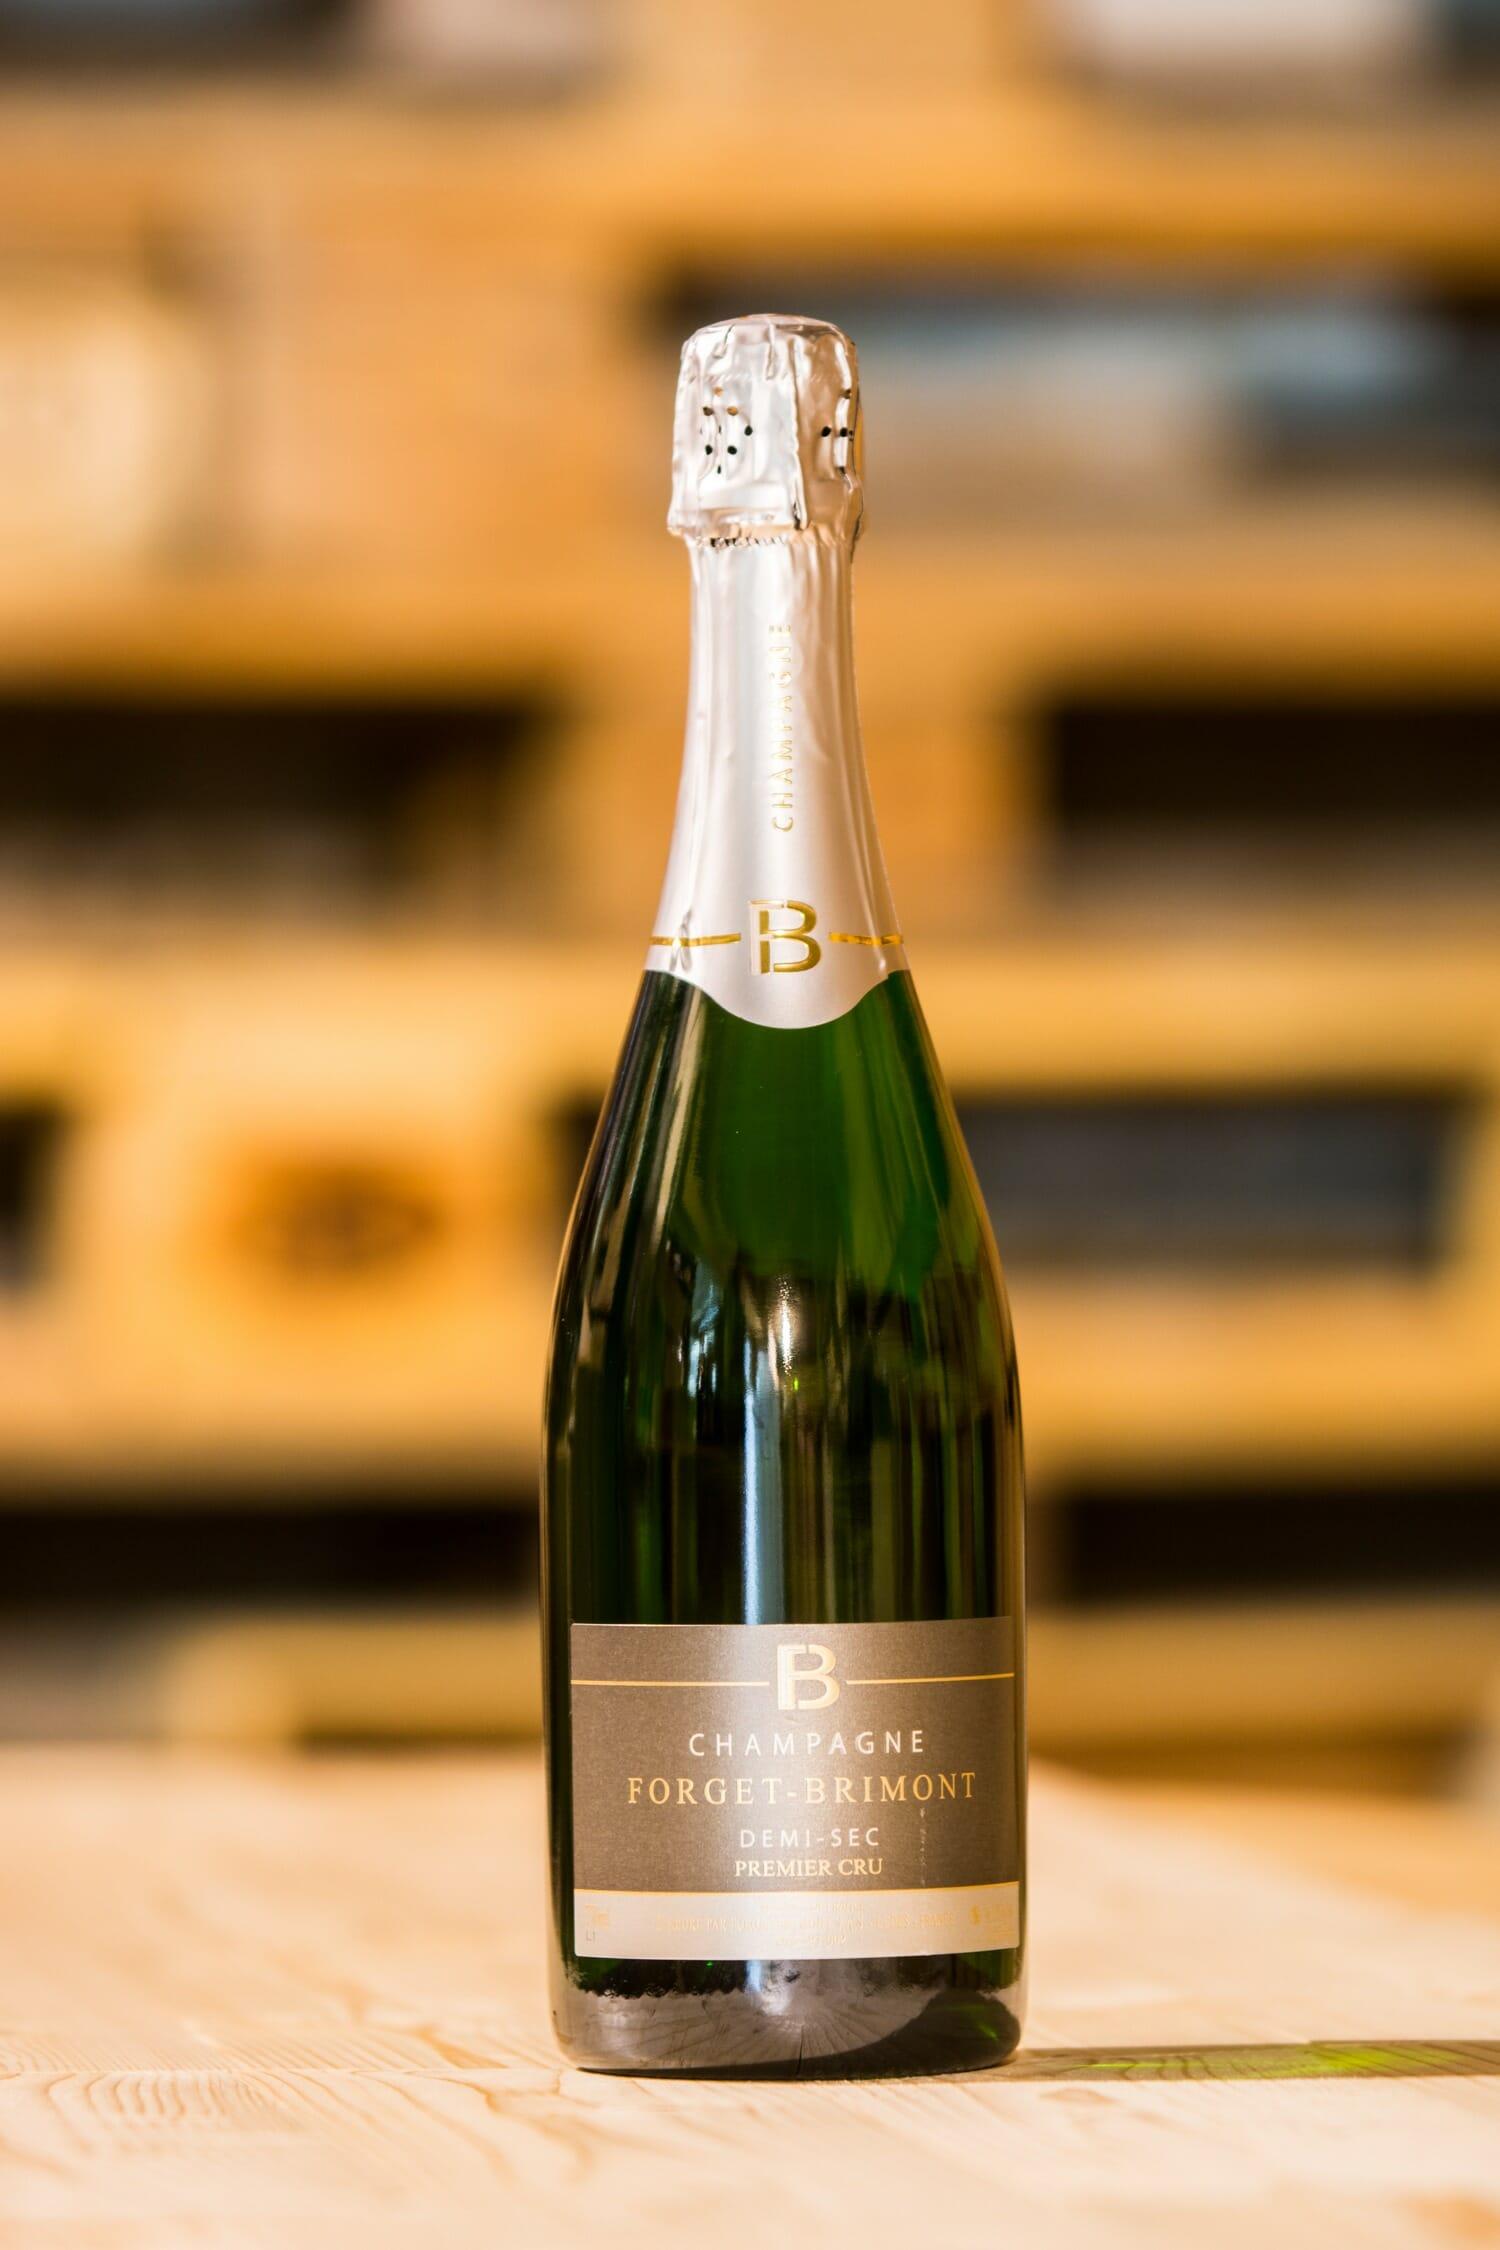 Champagne Forget-Brimont Demi Sec, Premier Cru